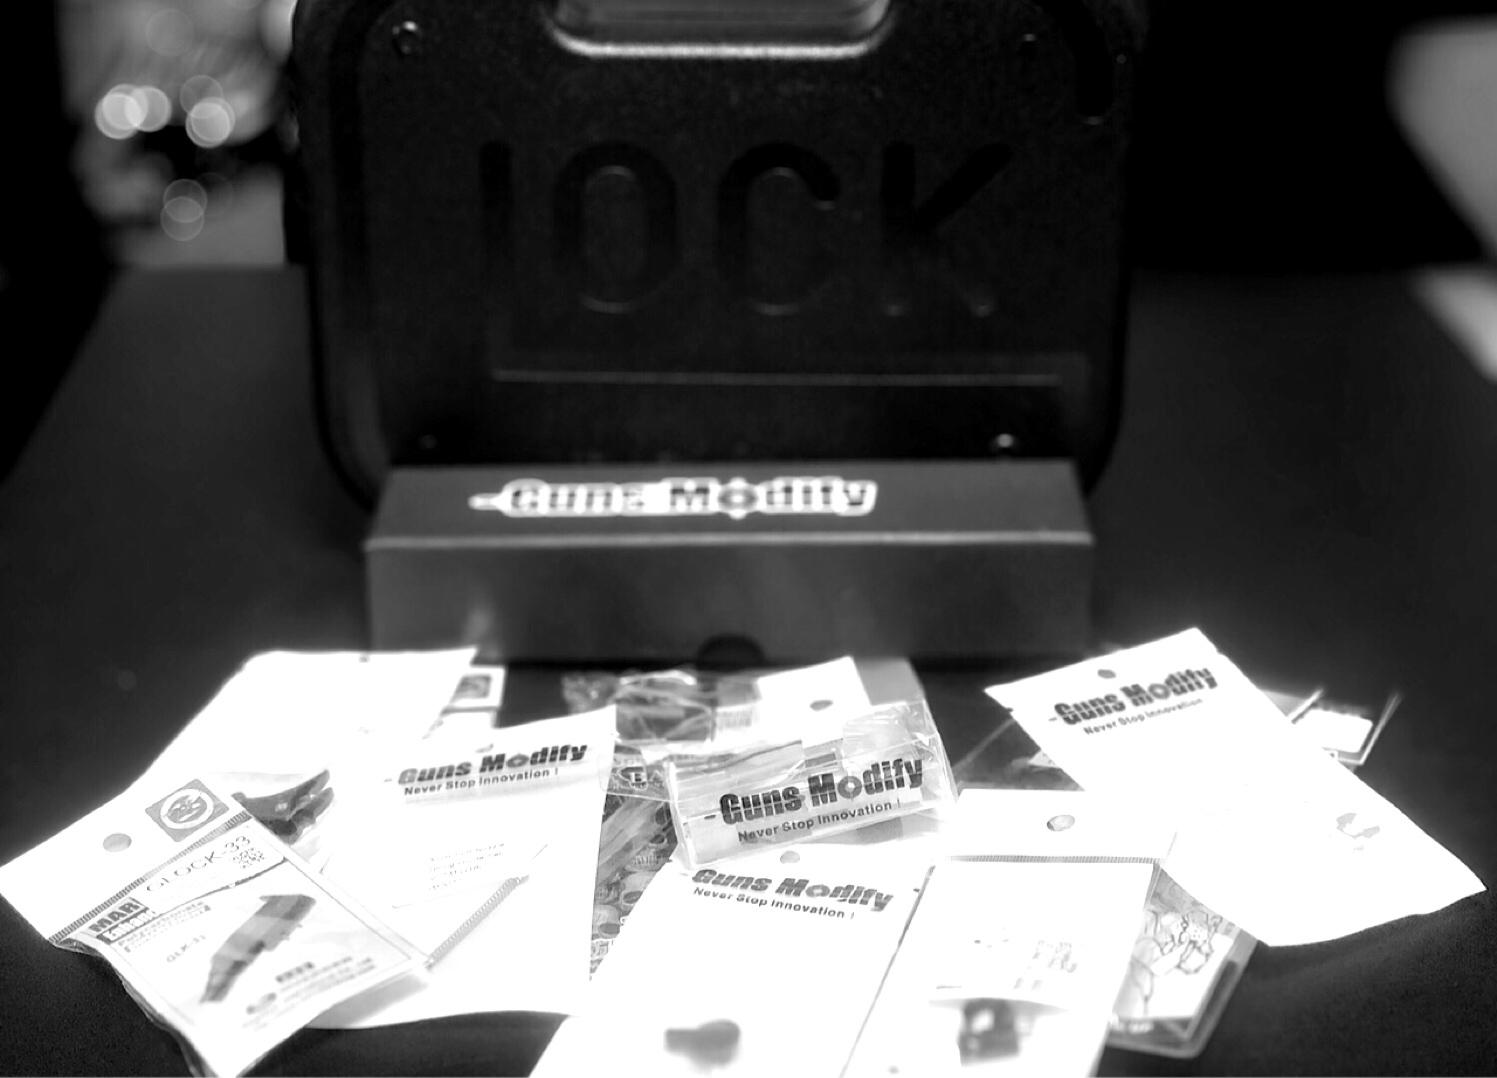 25 GunsModify GLOCK SAI アジャスタブルトリガー Ver3 GM0026 GM0079 に交換してみた! GLOCK G18C カスタム 購入 分解 取付 交換 取付方法 レビュー!!